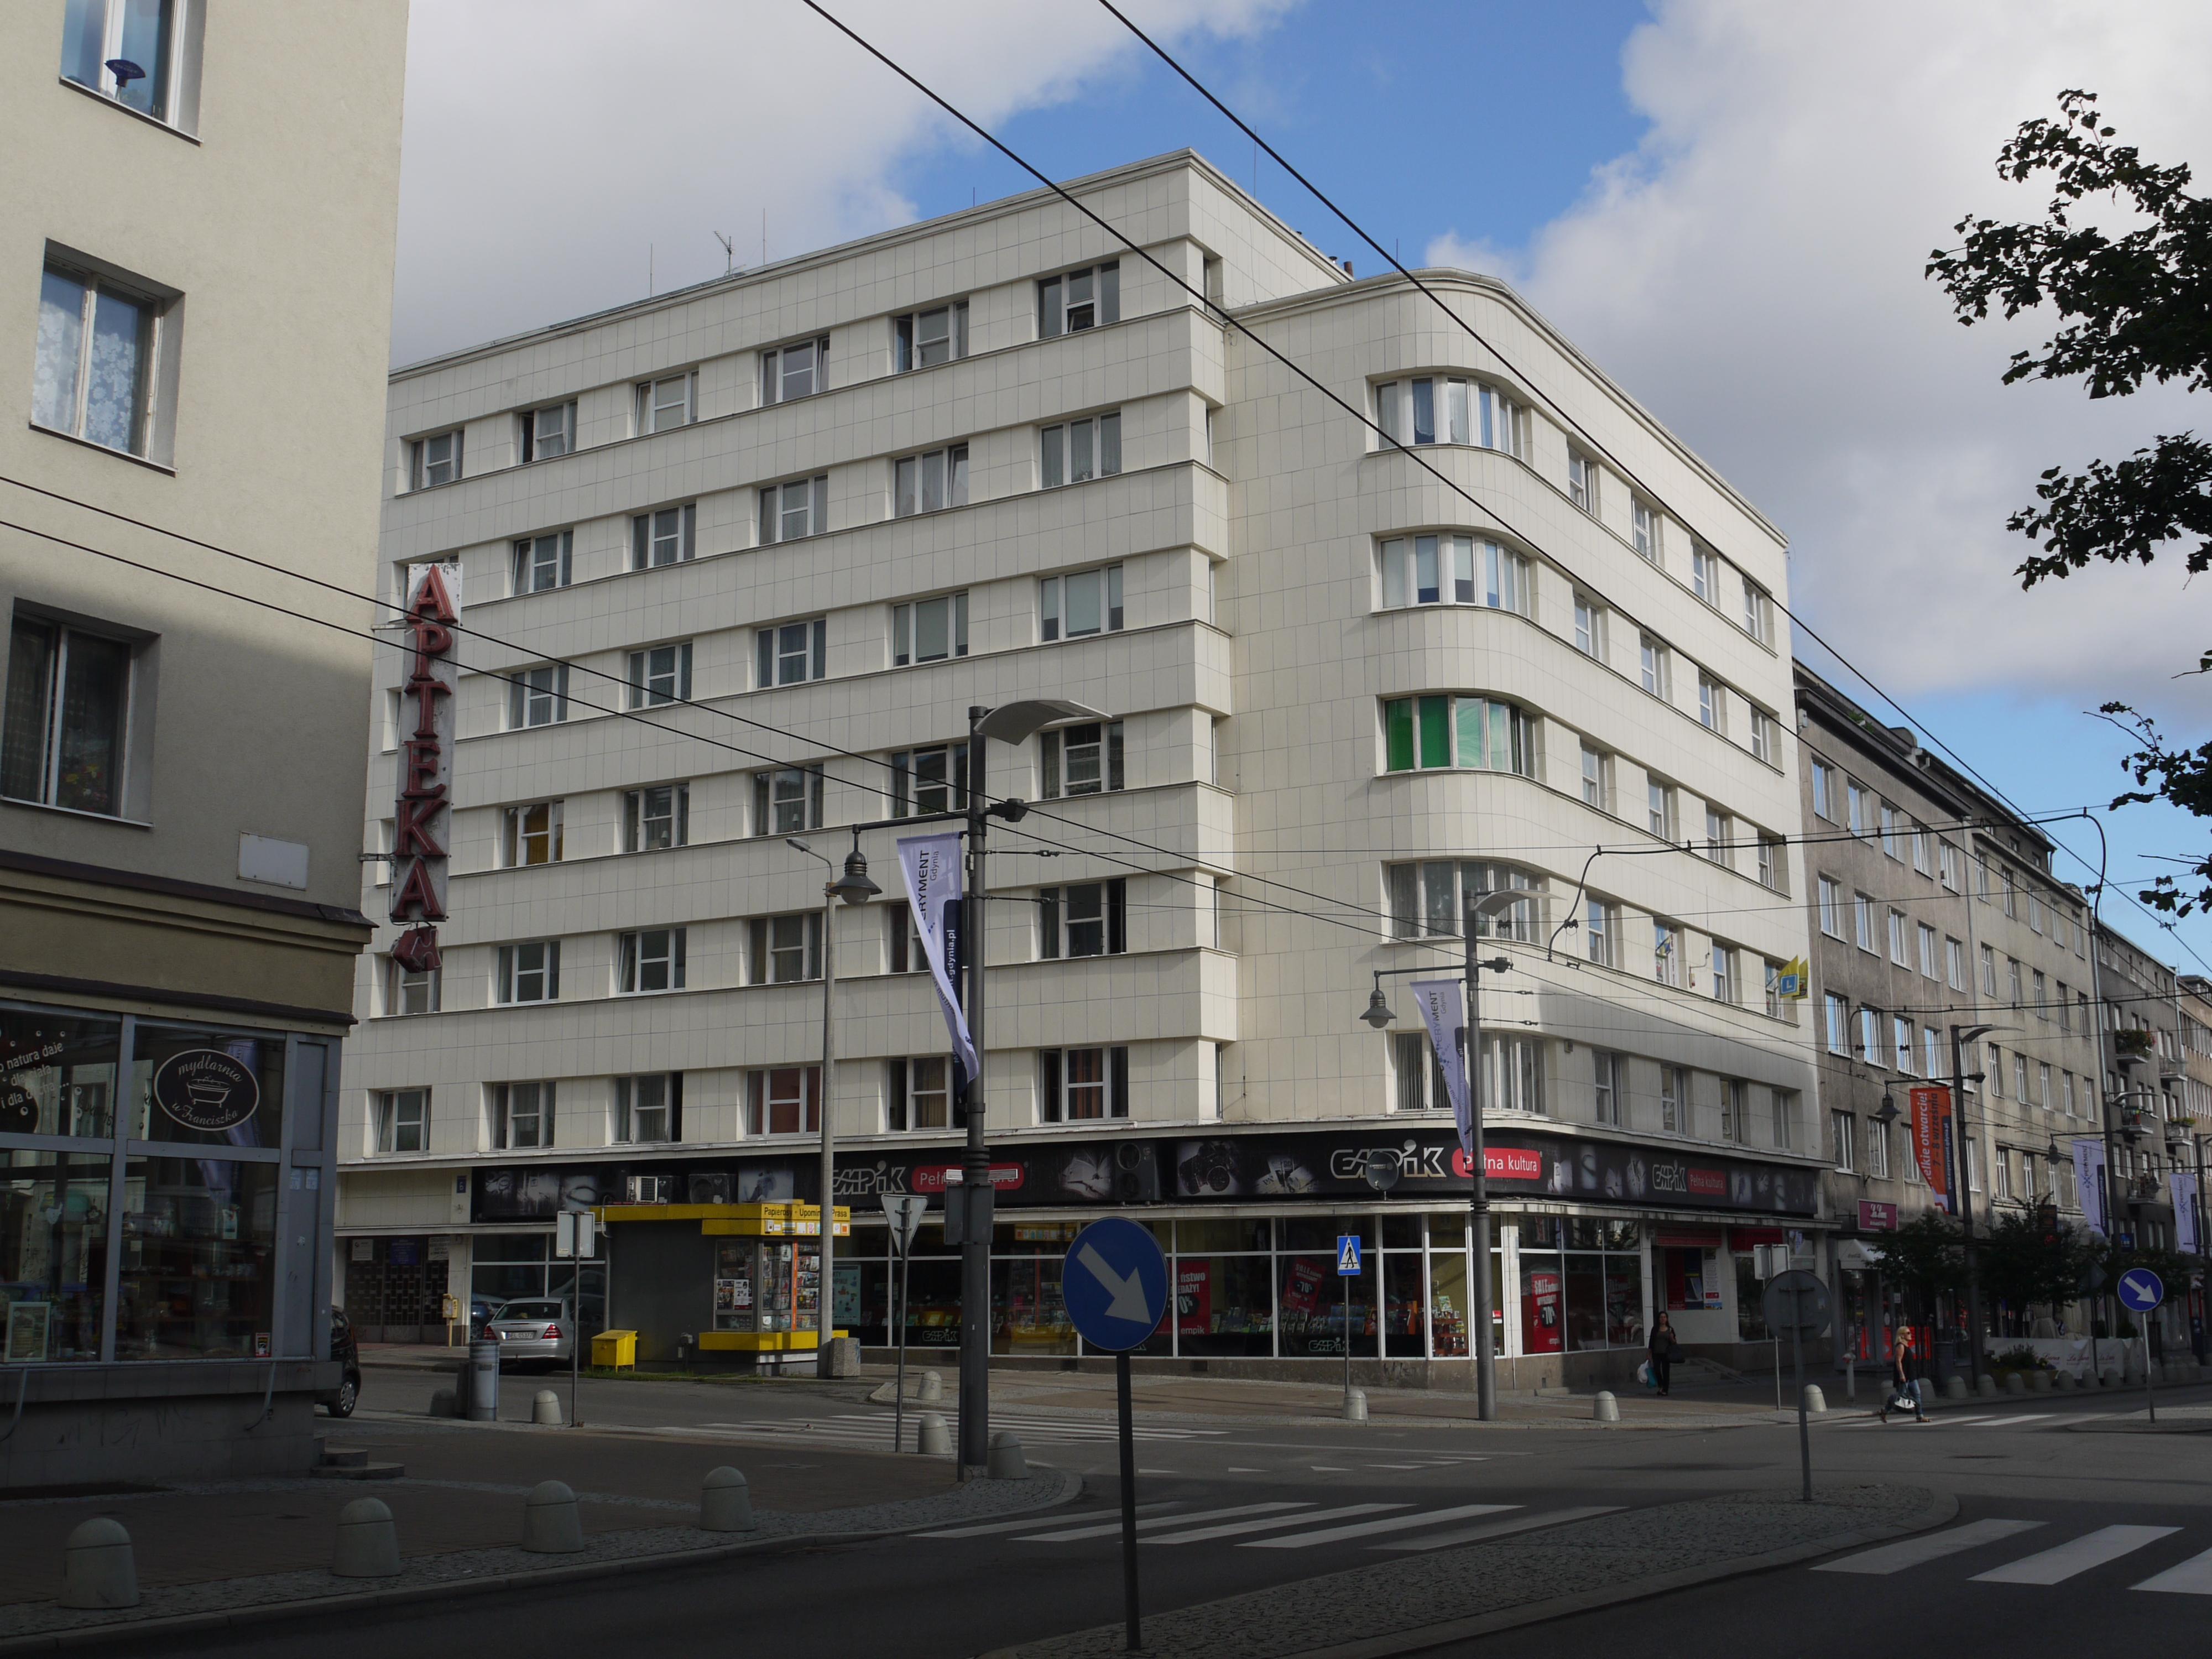 Gdynia,_Świętojańska_68